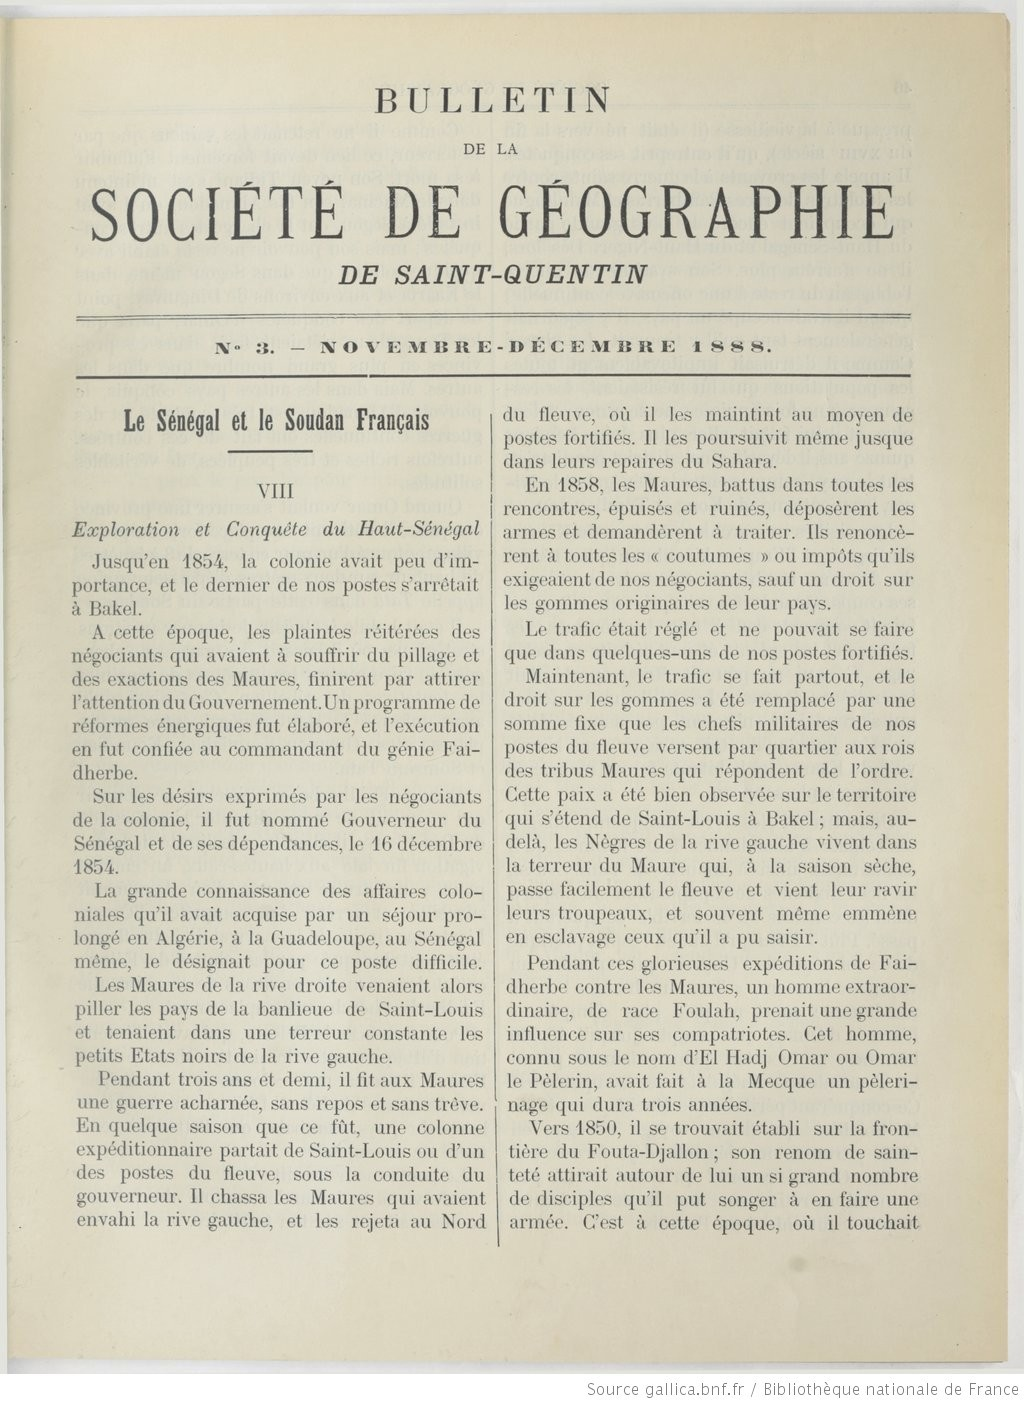 https://gallica.bnf.fr/ark:/12148/bpt6k6547280d.highres.jpg